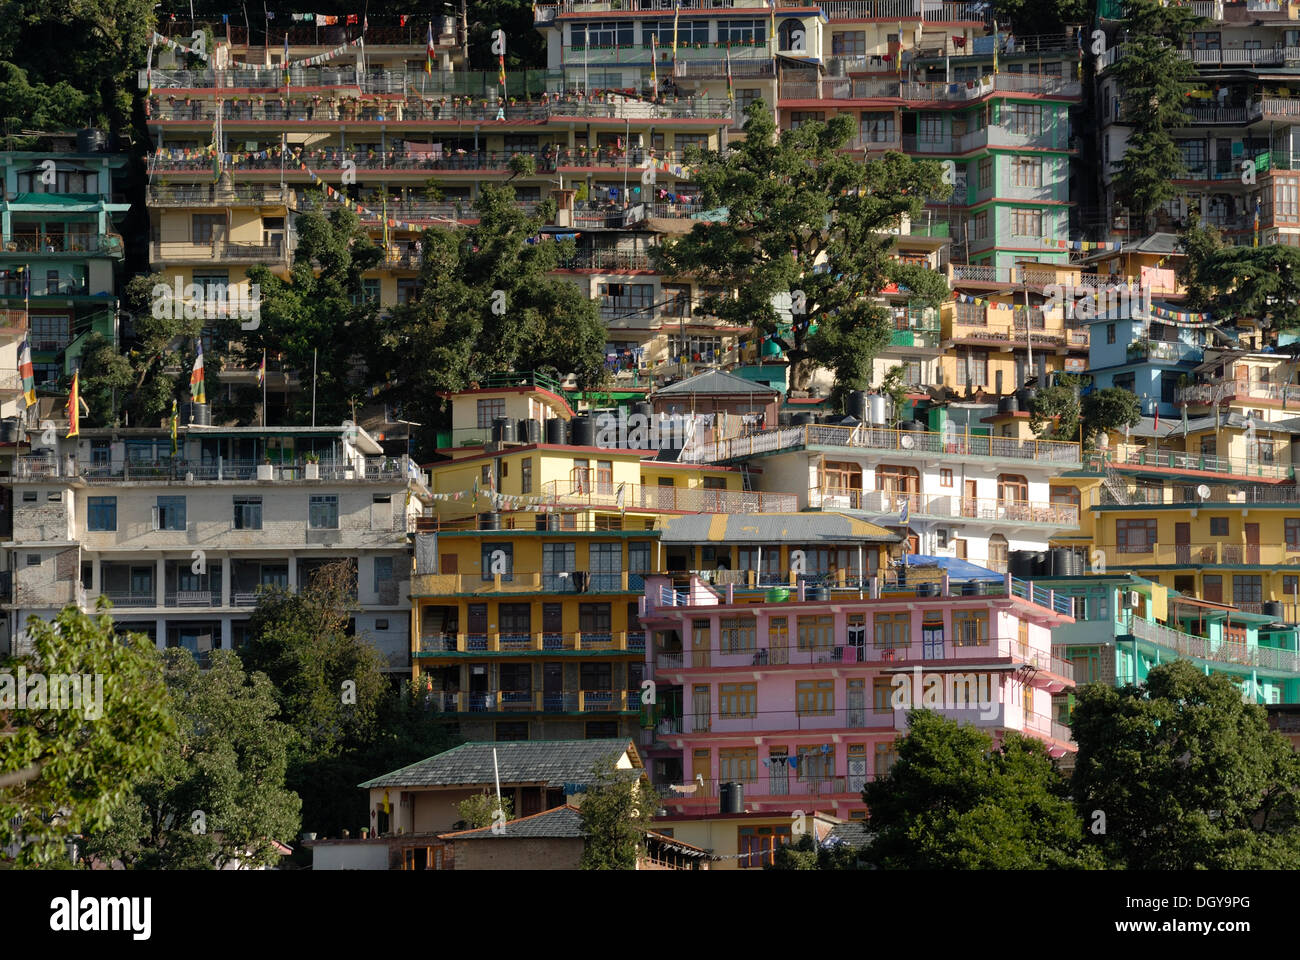 Residential buildings of exiled Tibetans with cedars, Upper Dharamsala, McLeod Ganj, Himachal Pradesh, Himalayas, India, Asia - Stock Image